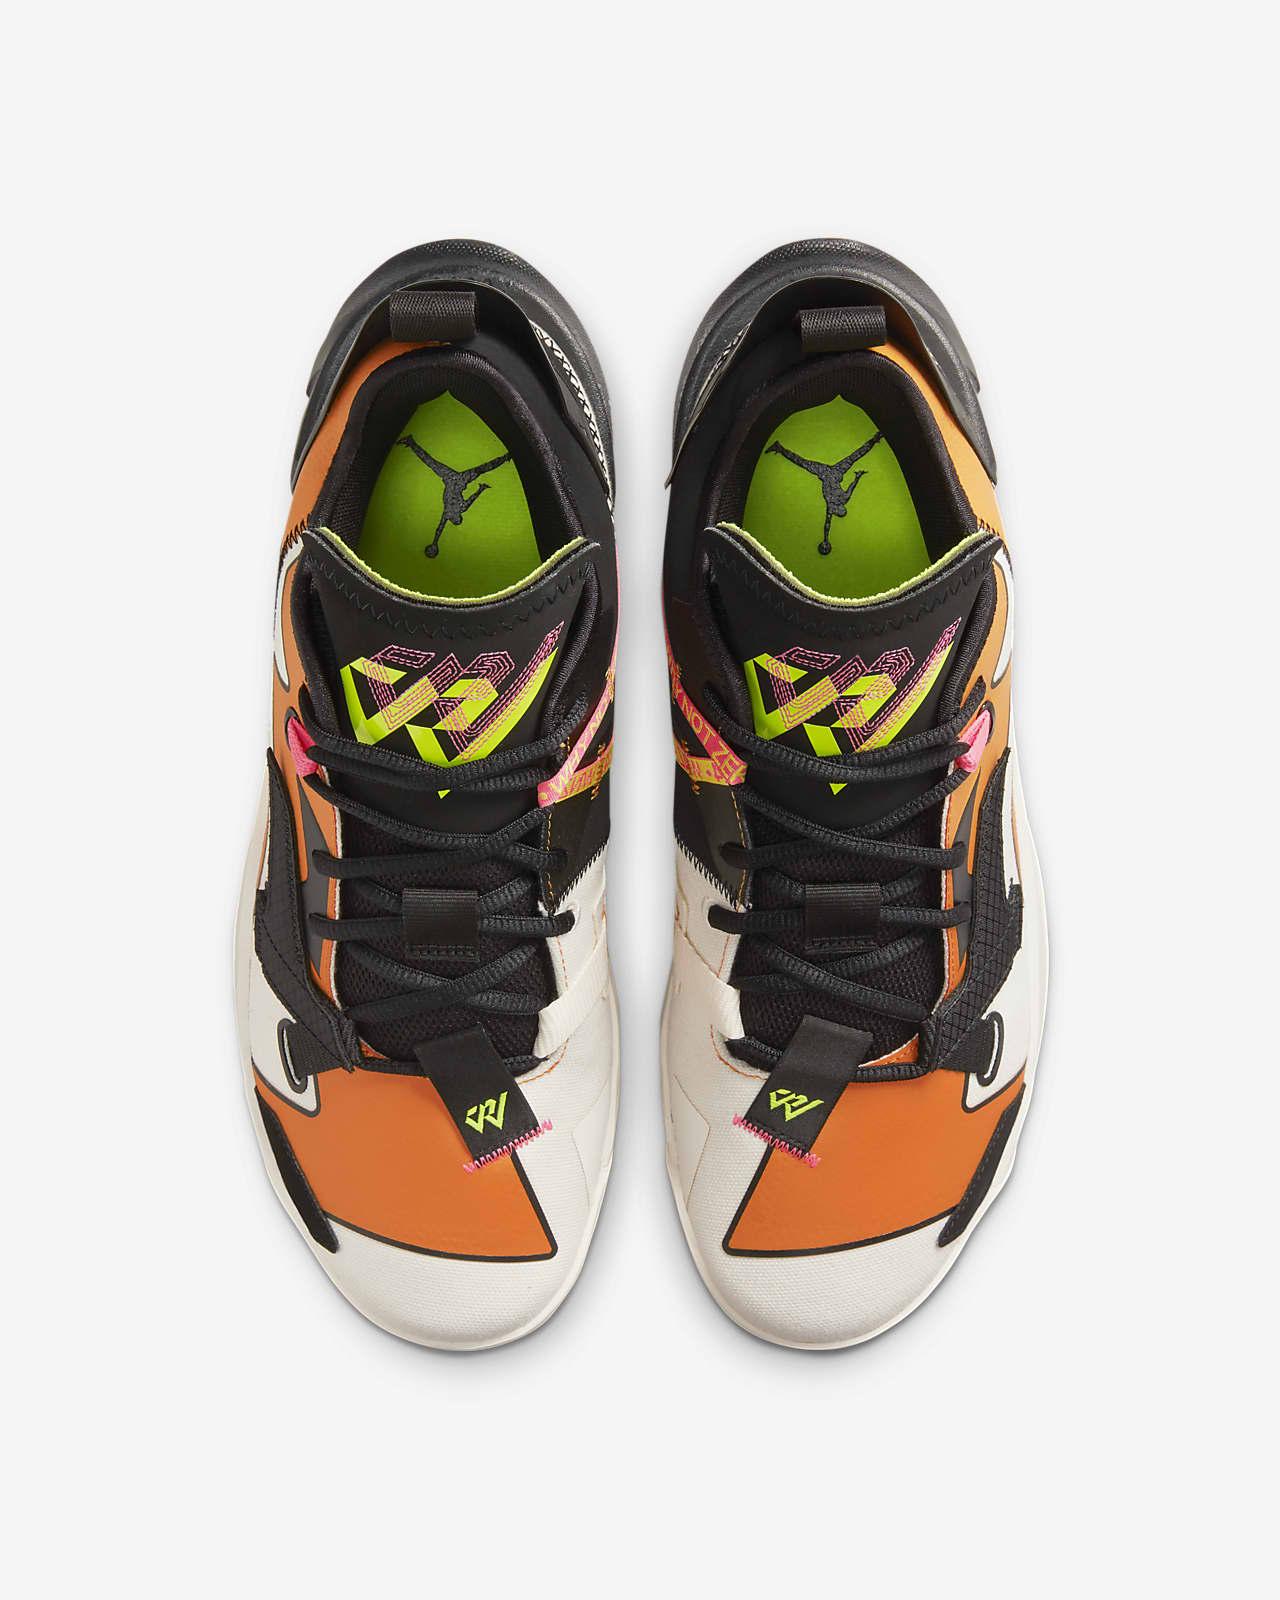 Jordan 'Why Not?' Zer0.4 Basketball Shoes. Nike.com